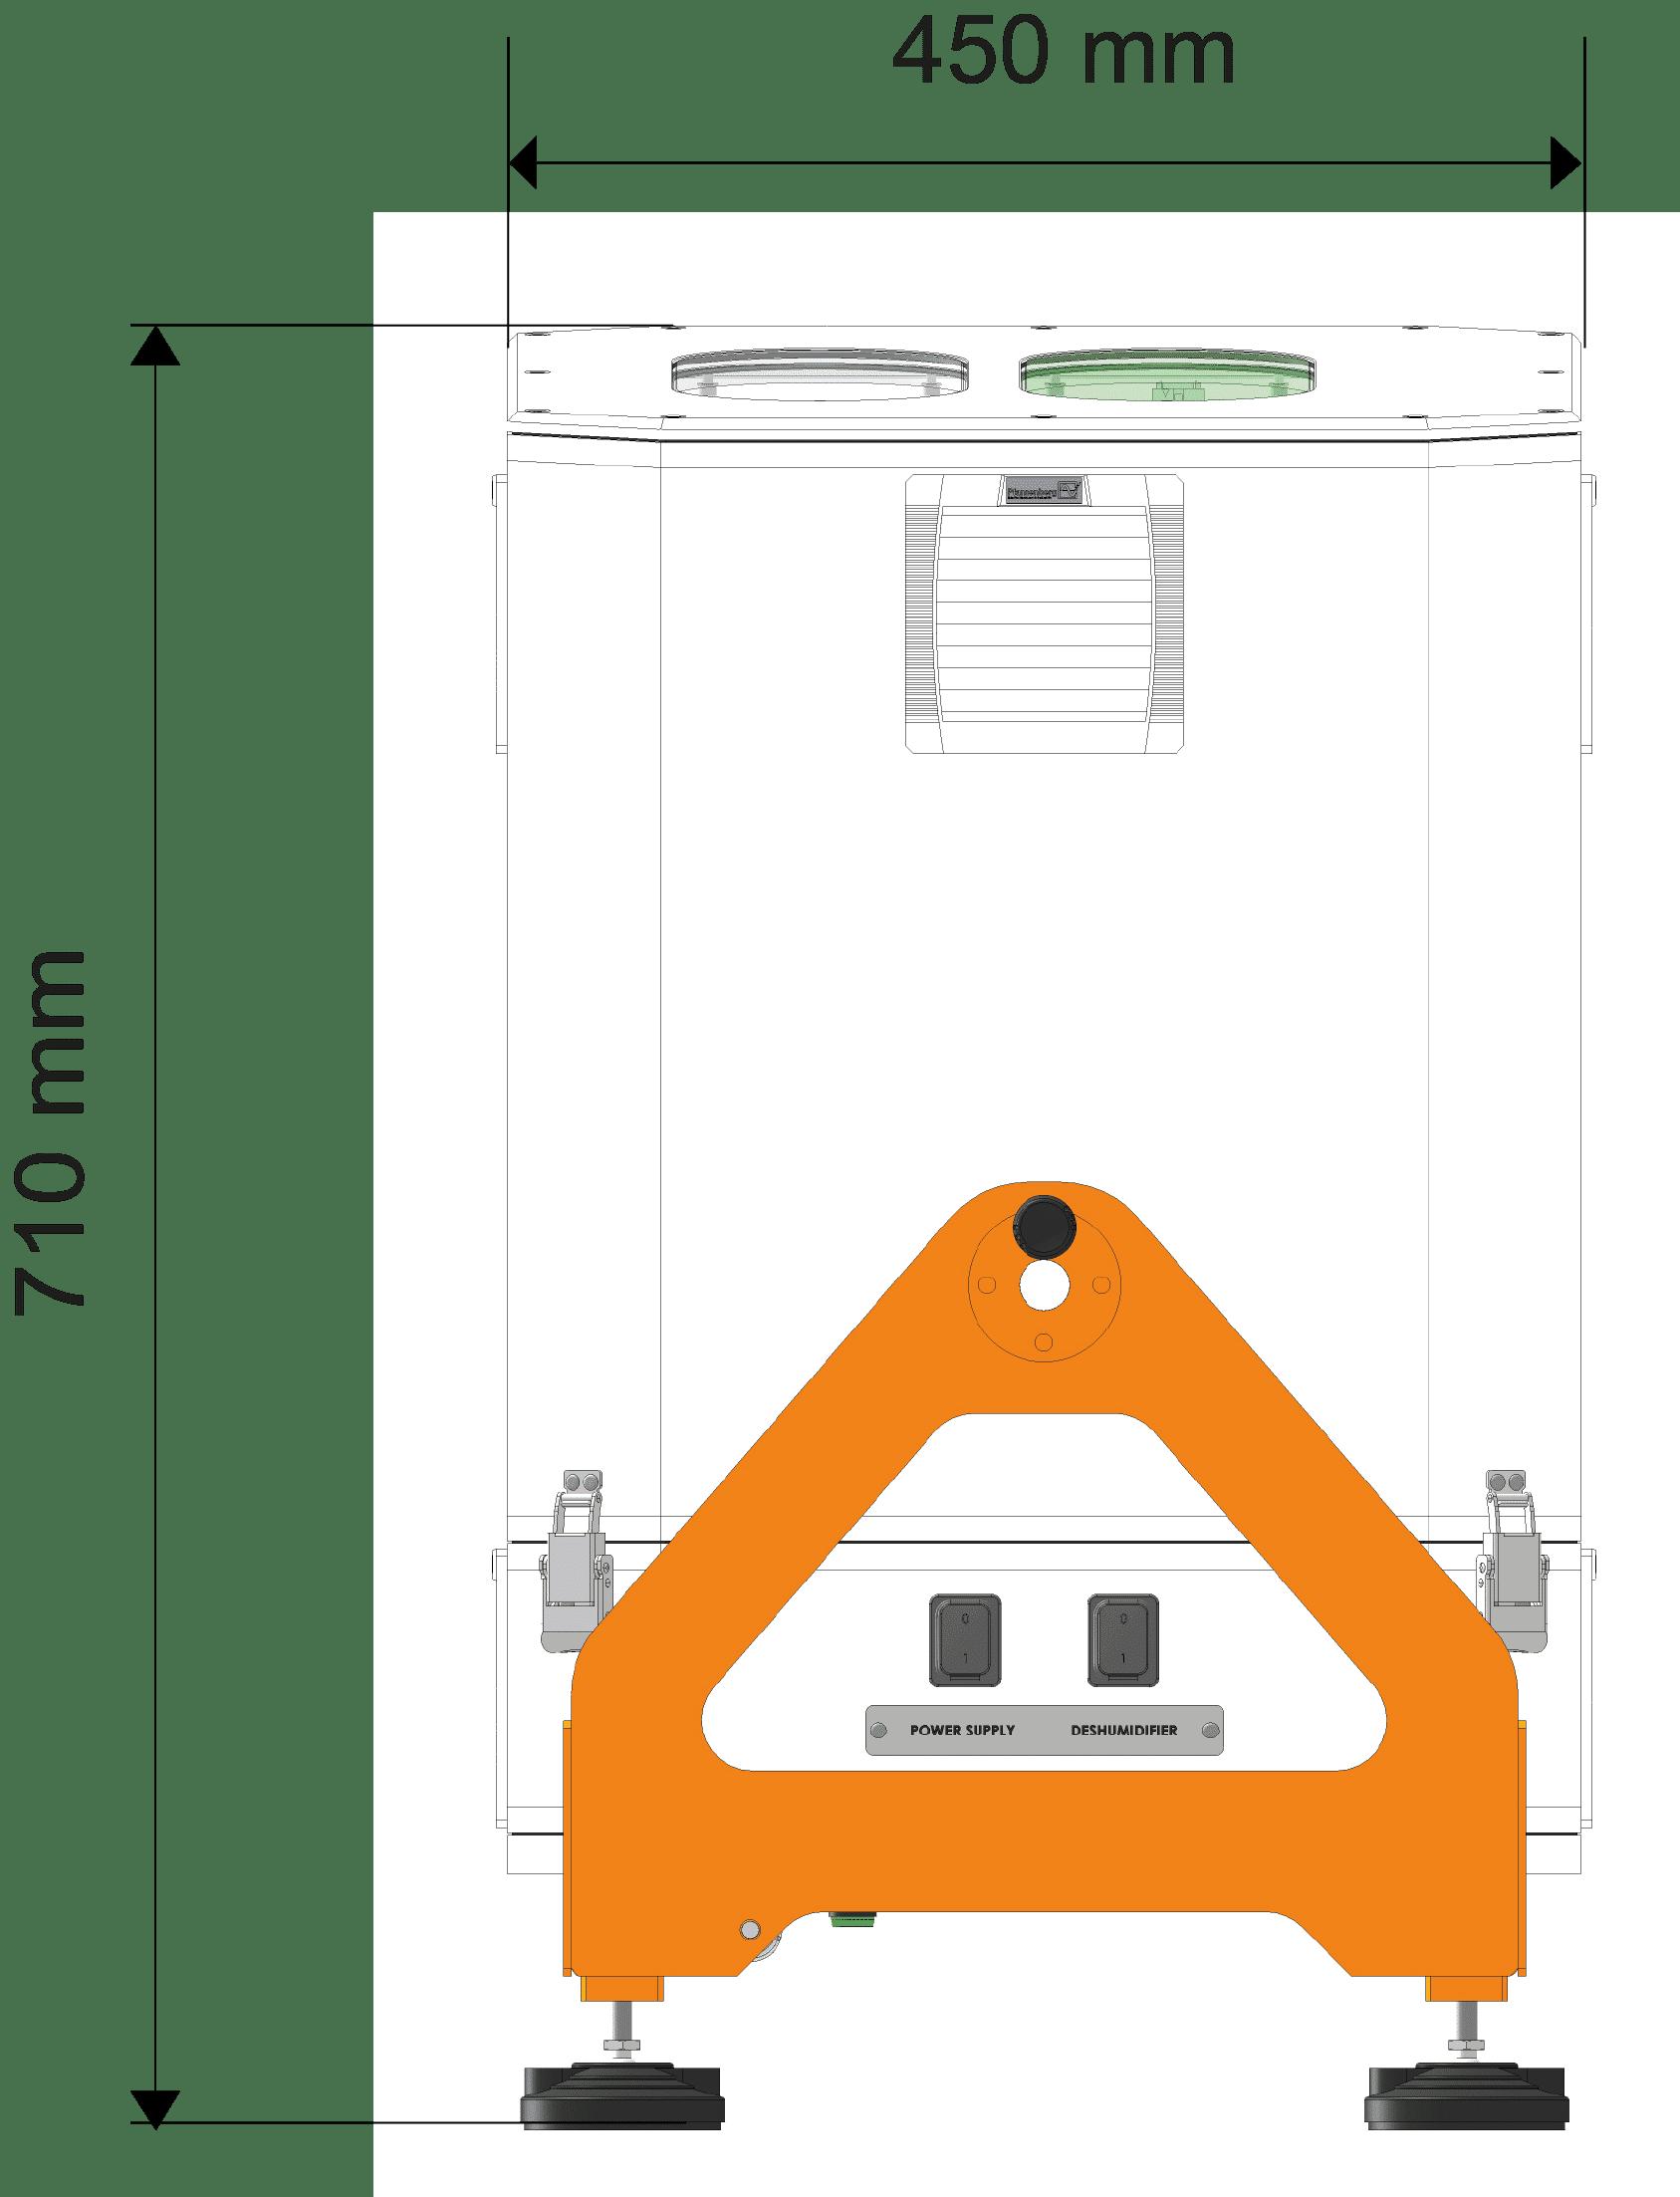 CE376 LIDAR